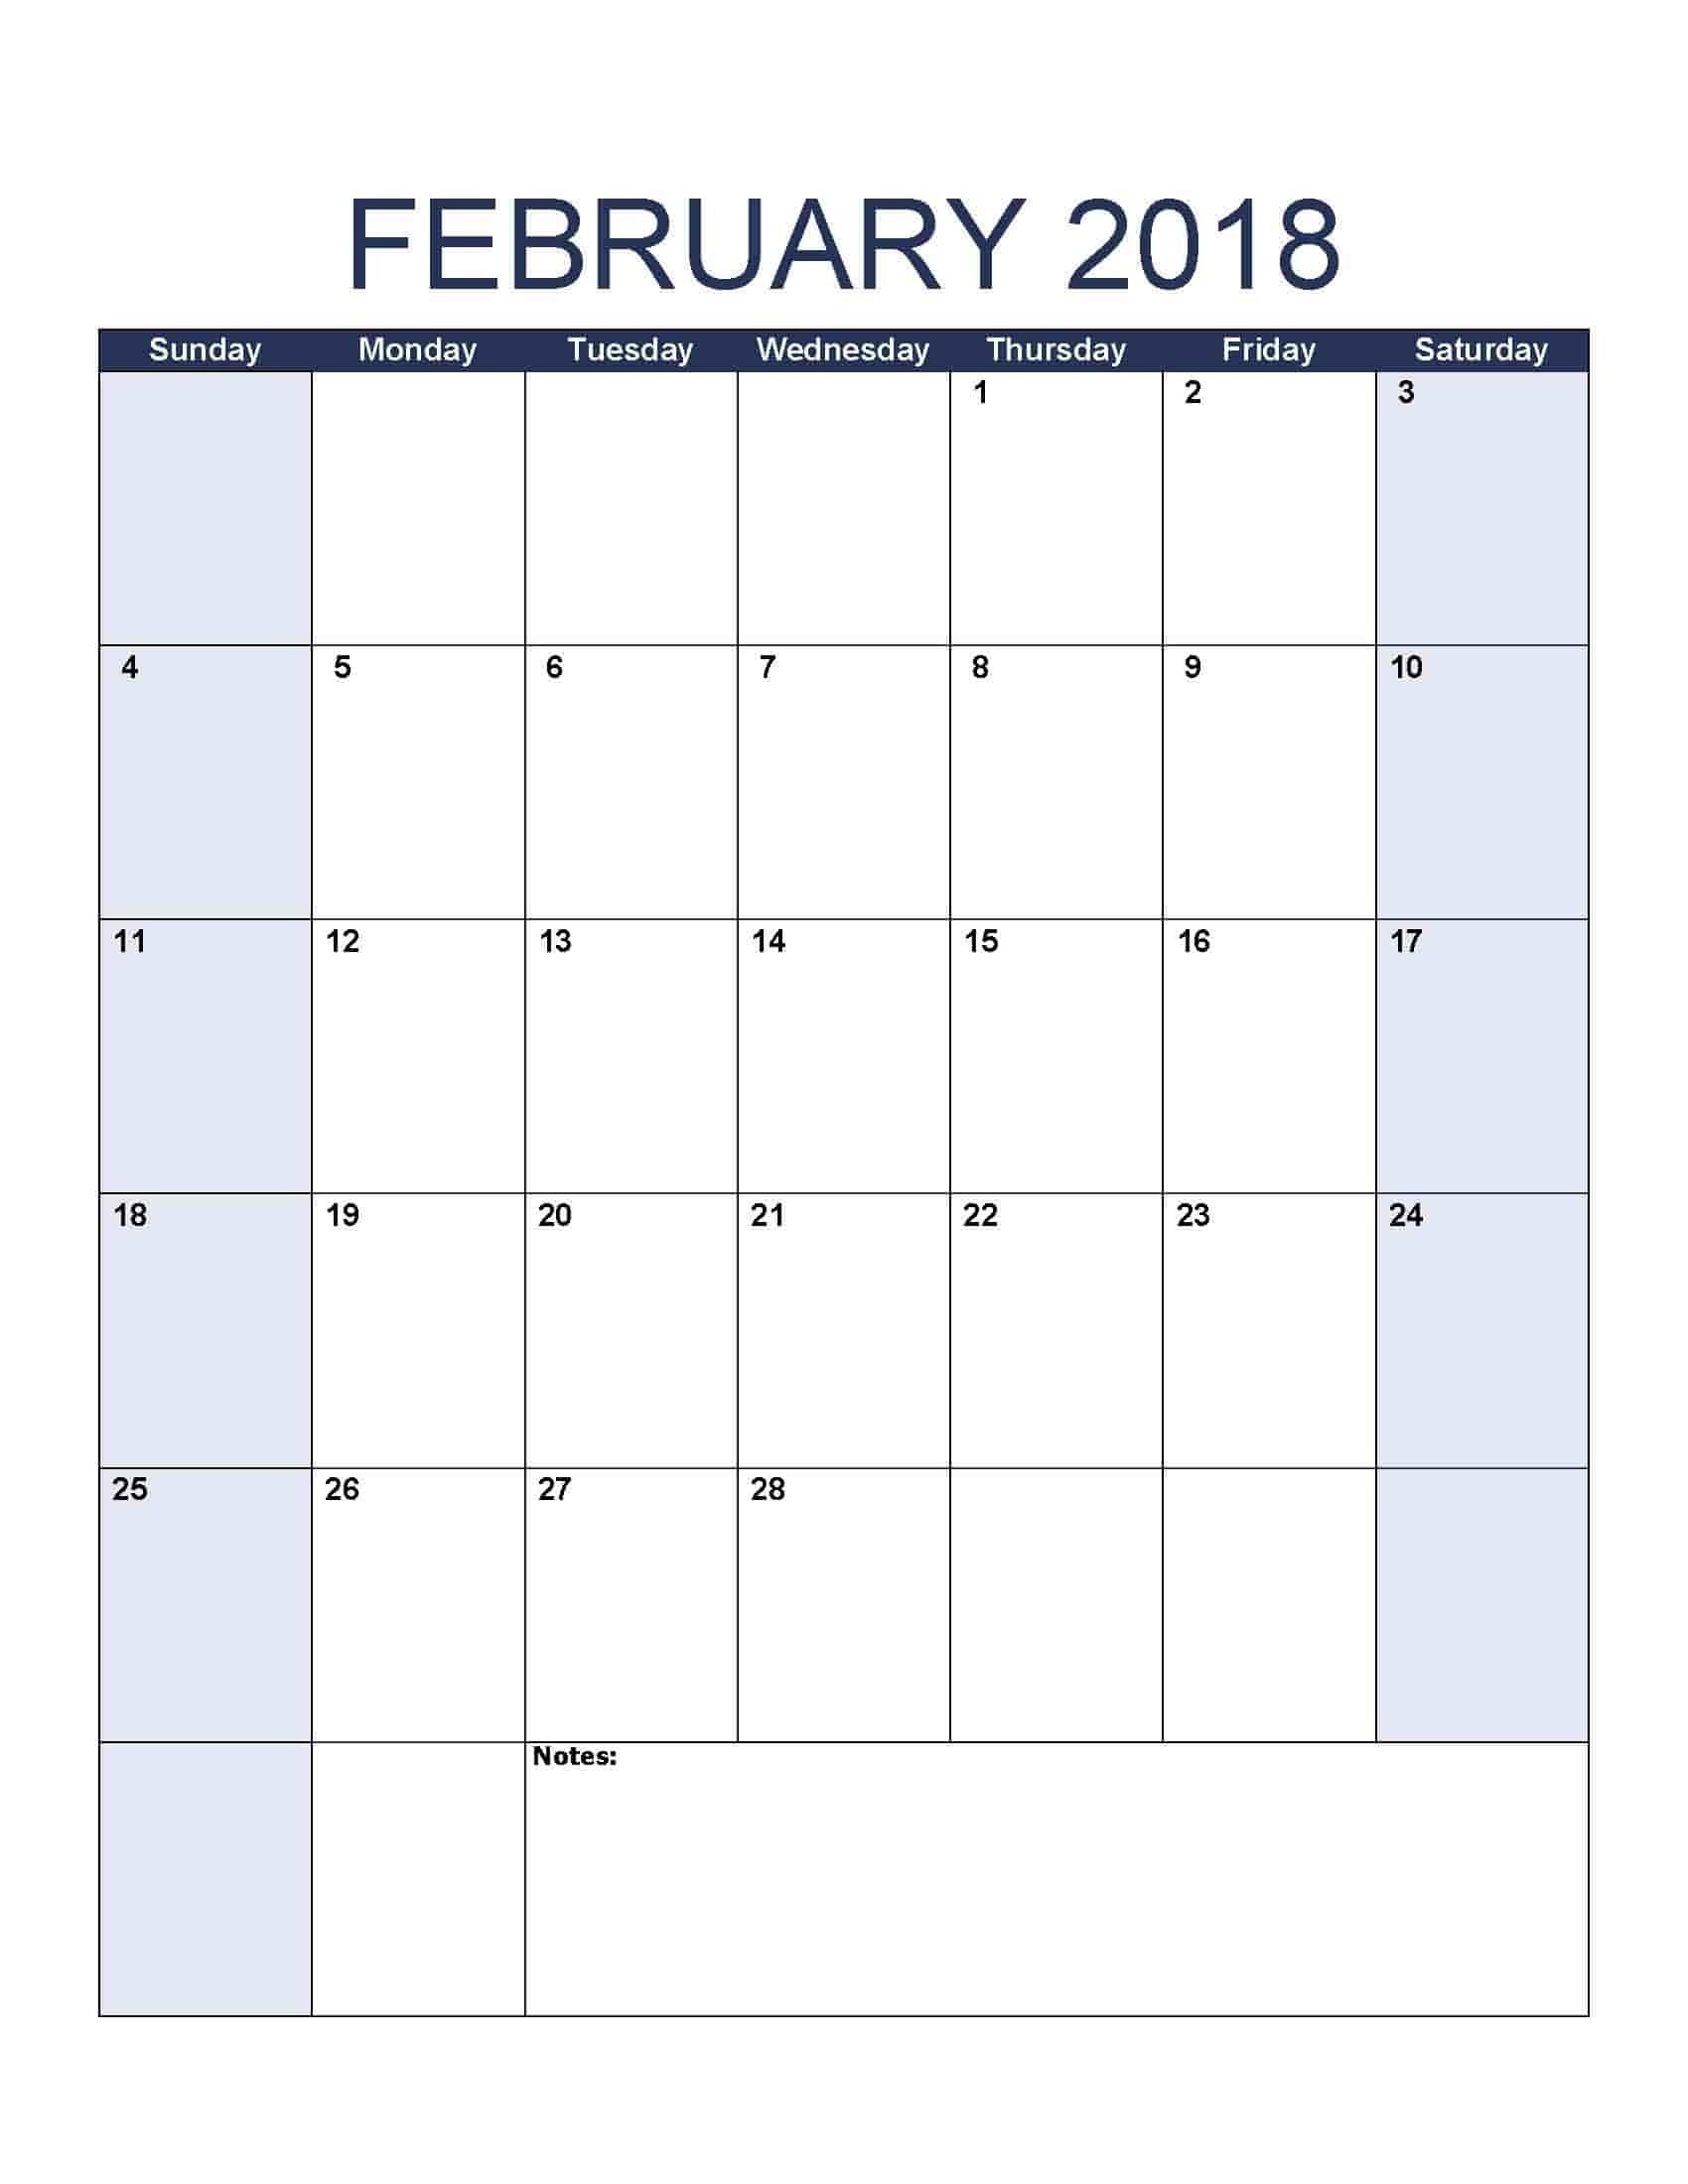 February 2018 Calendar - Free, Printable Calendar Templates 8.5 By 14 Printable Calendars